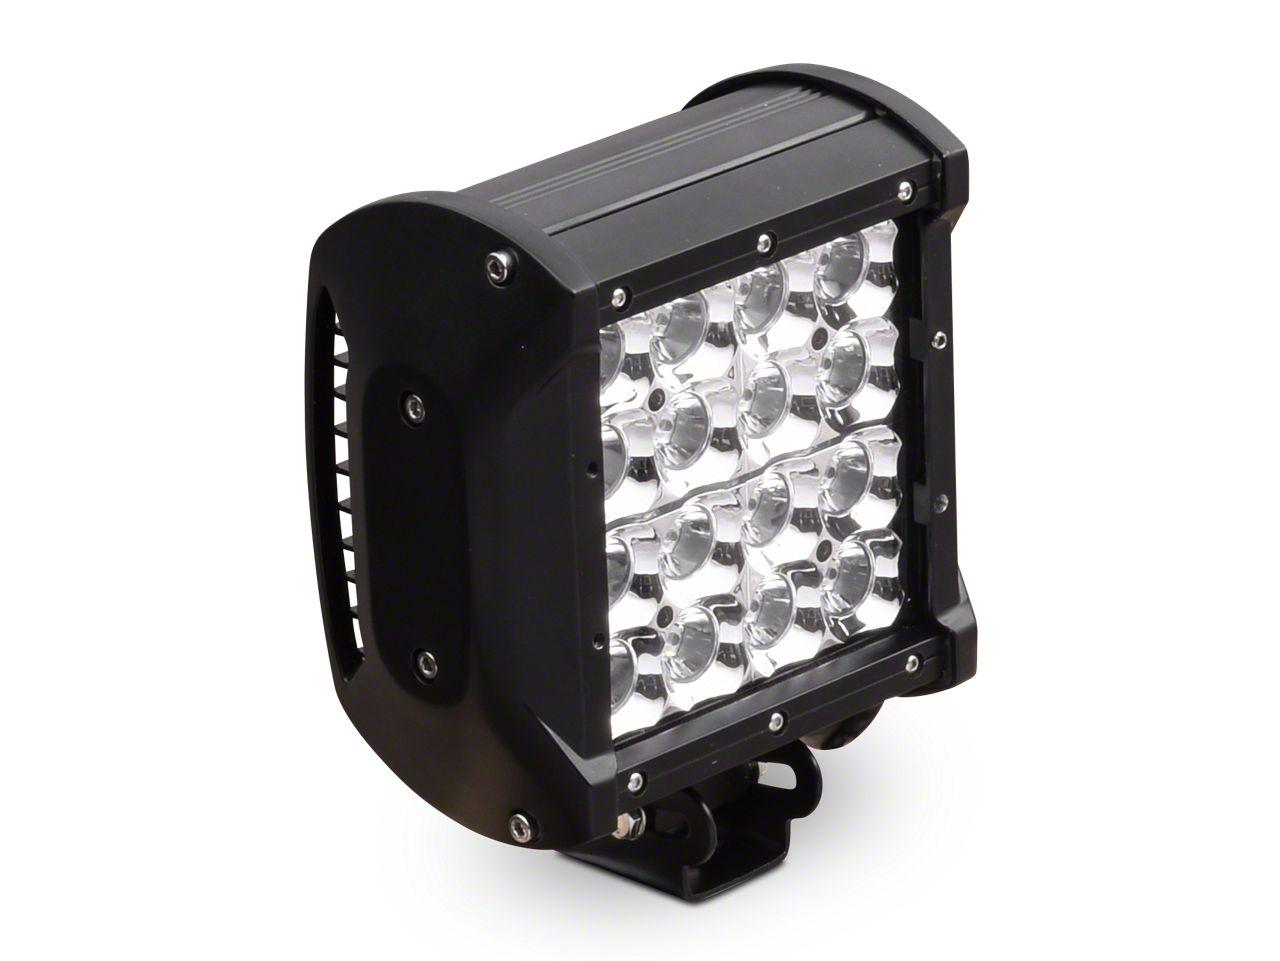 Alteon 5 in. 6 Series LED Light Bar - Flood/Spot Combo